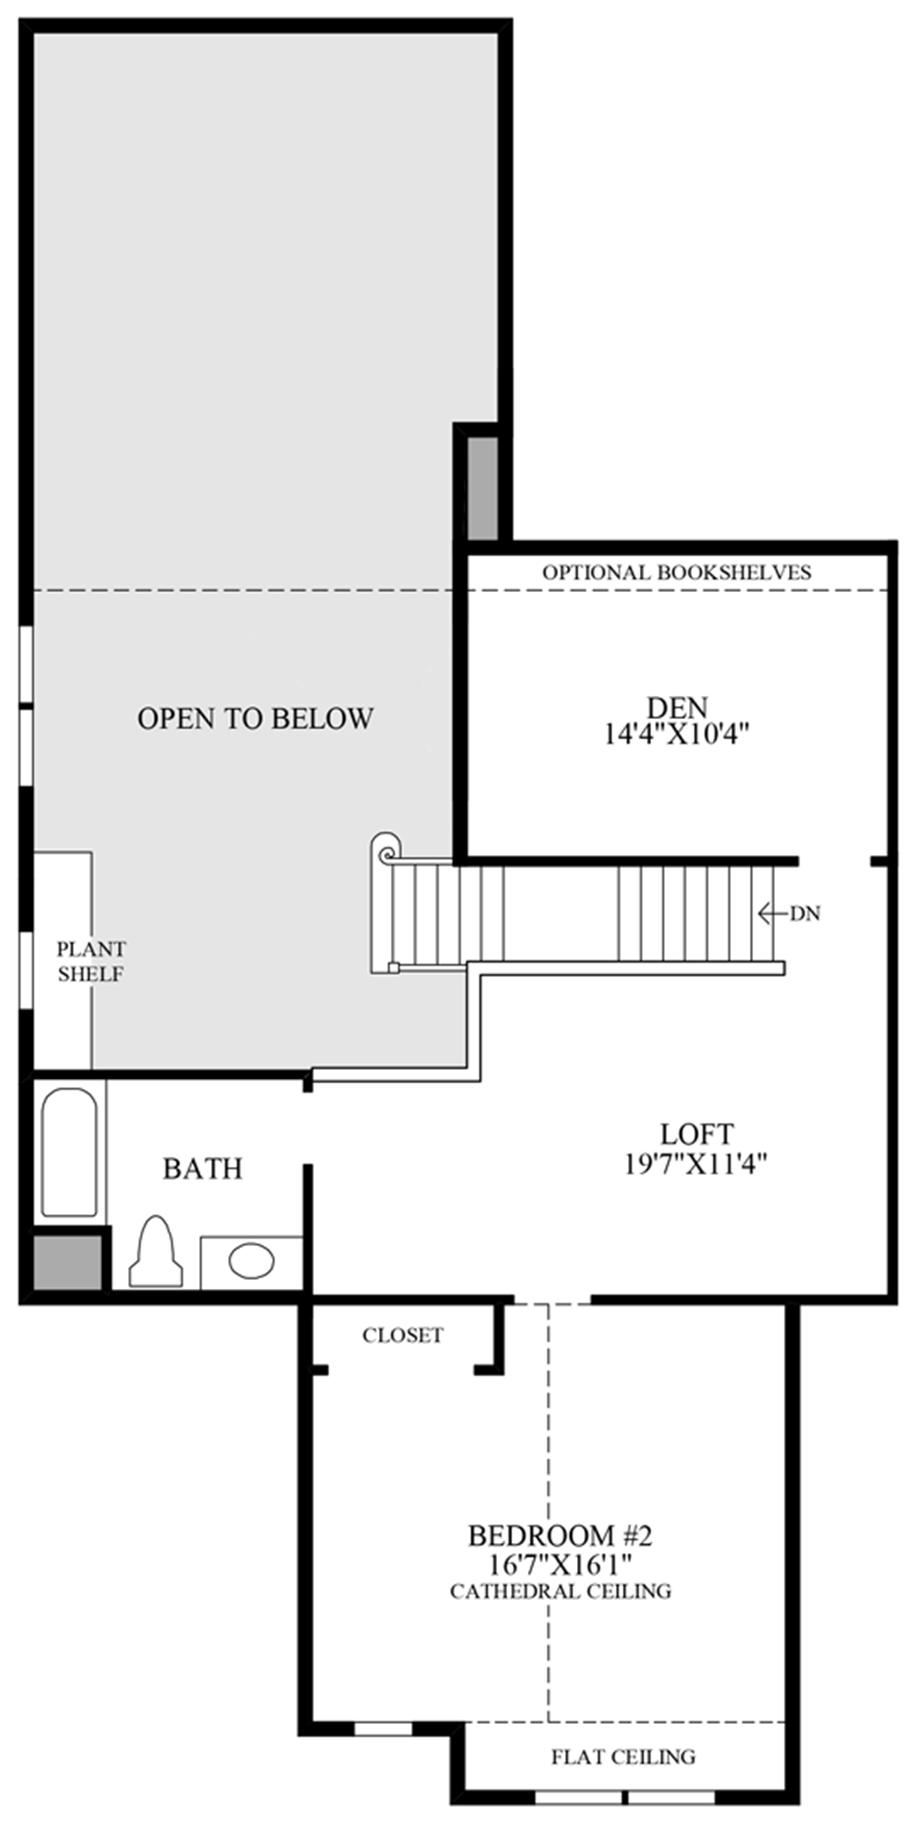 Optional Alternate 2nd Floor Floor Plan